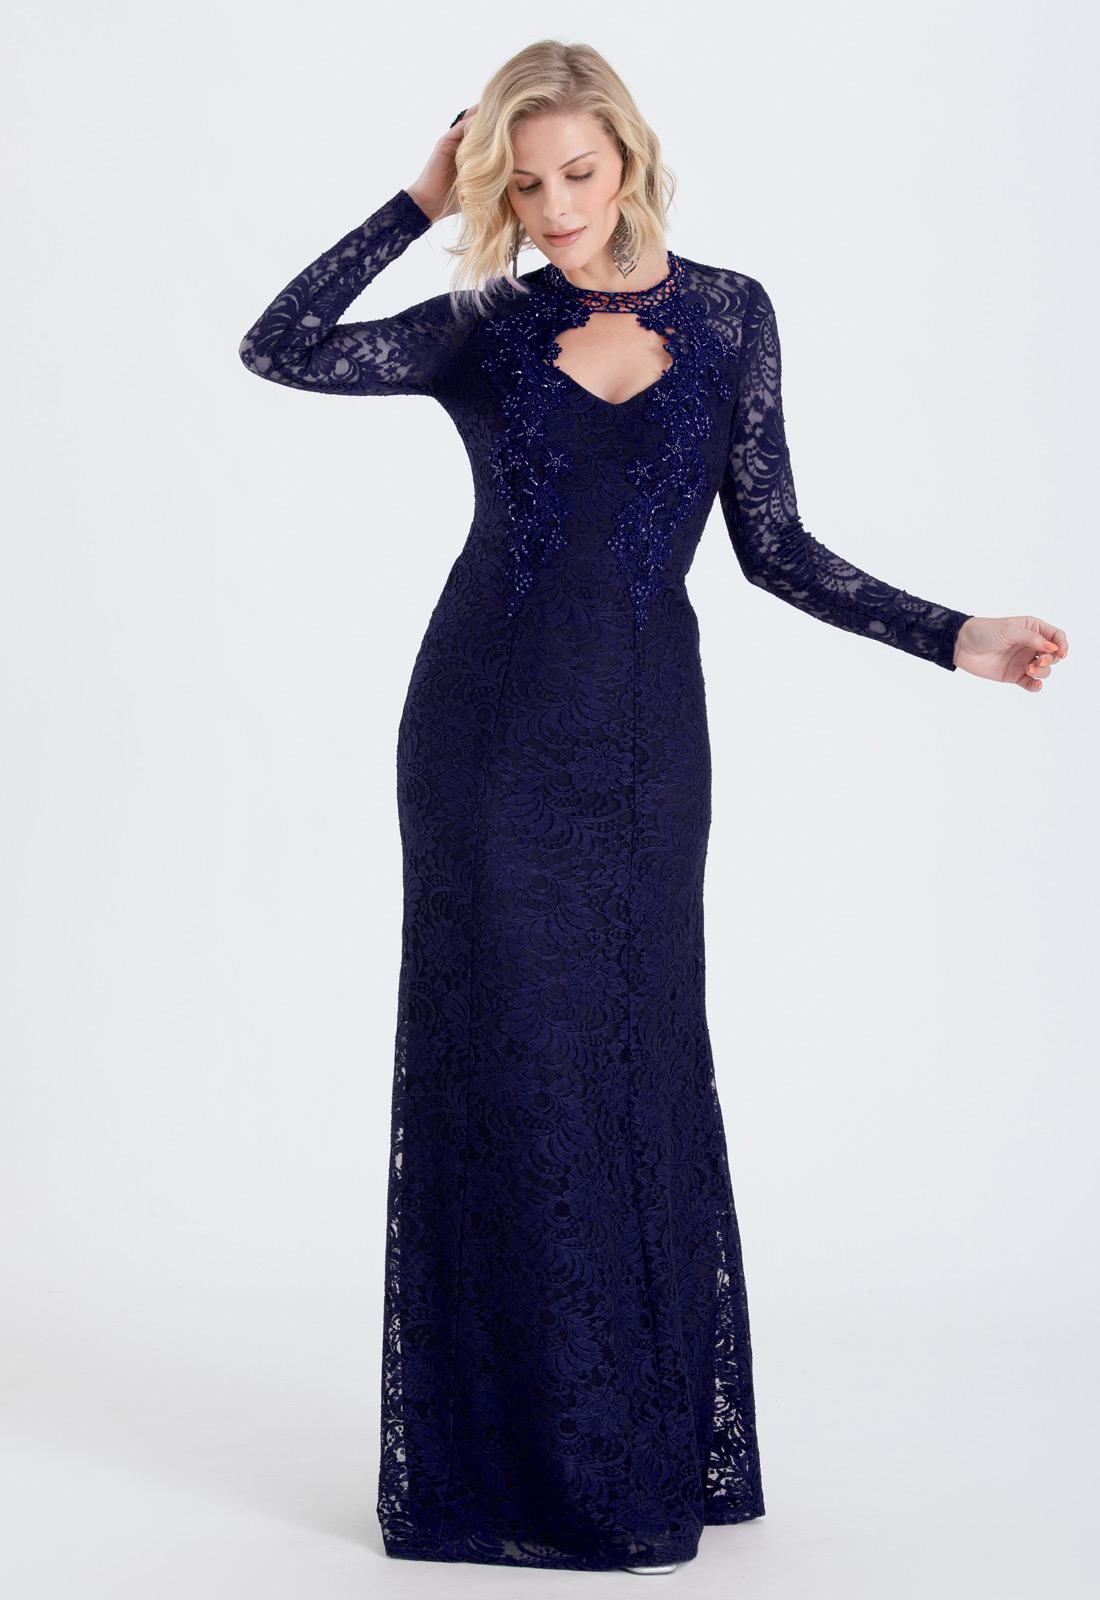 Vestido de renda Marinho manga longa Ref. 2424